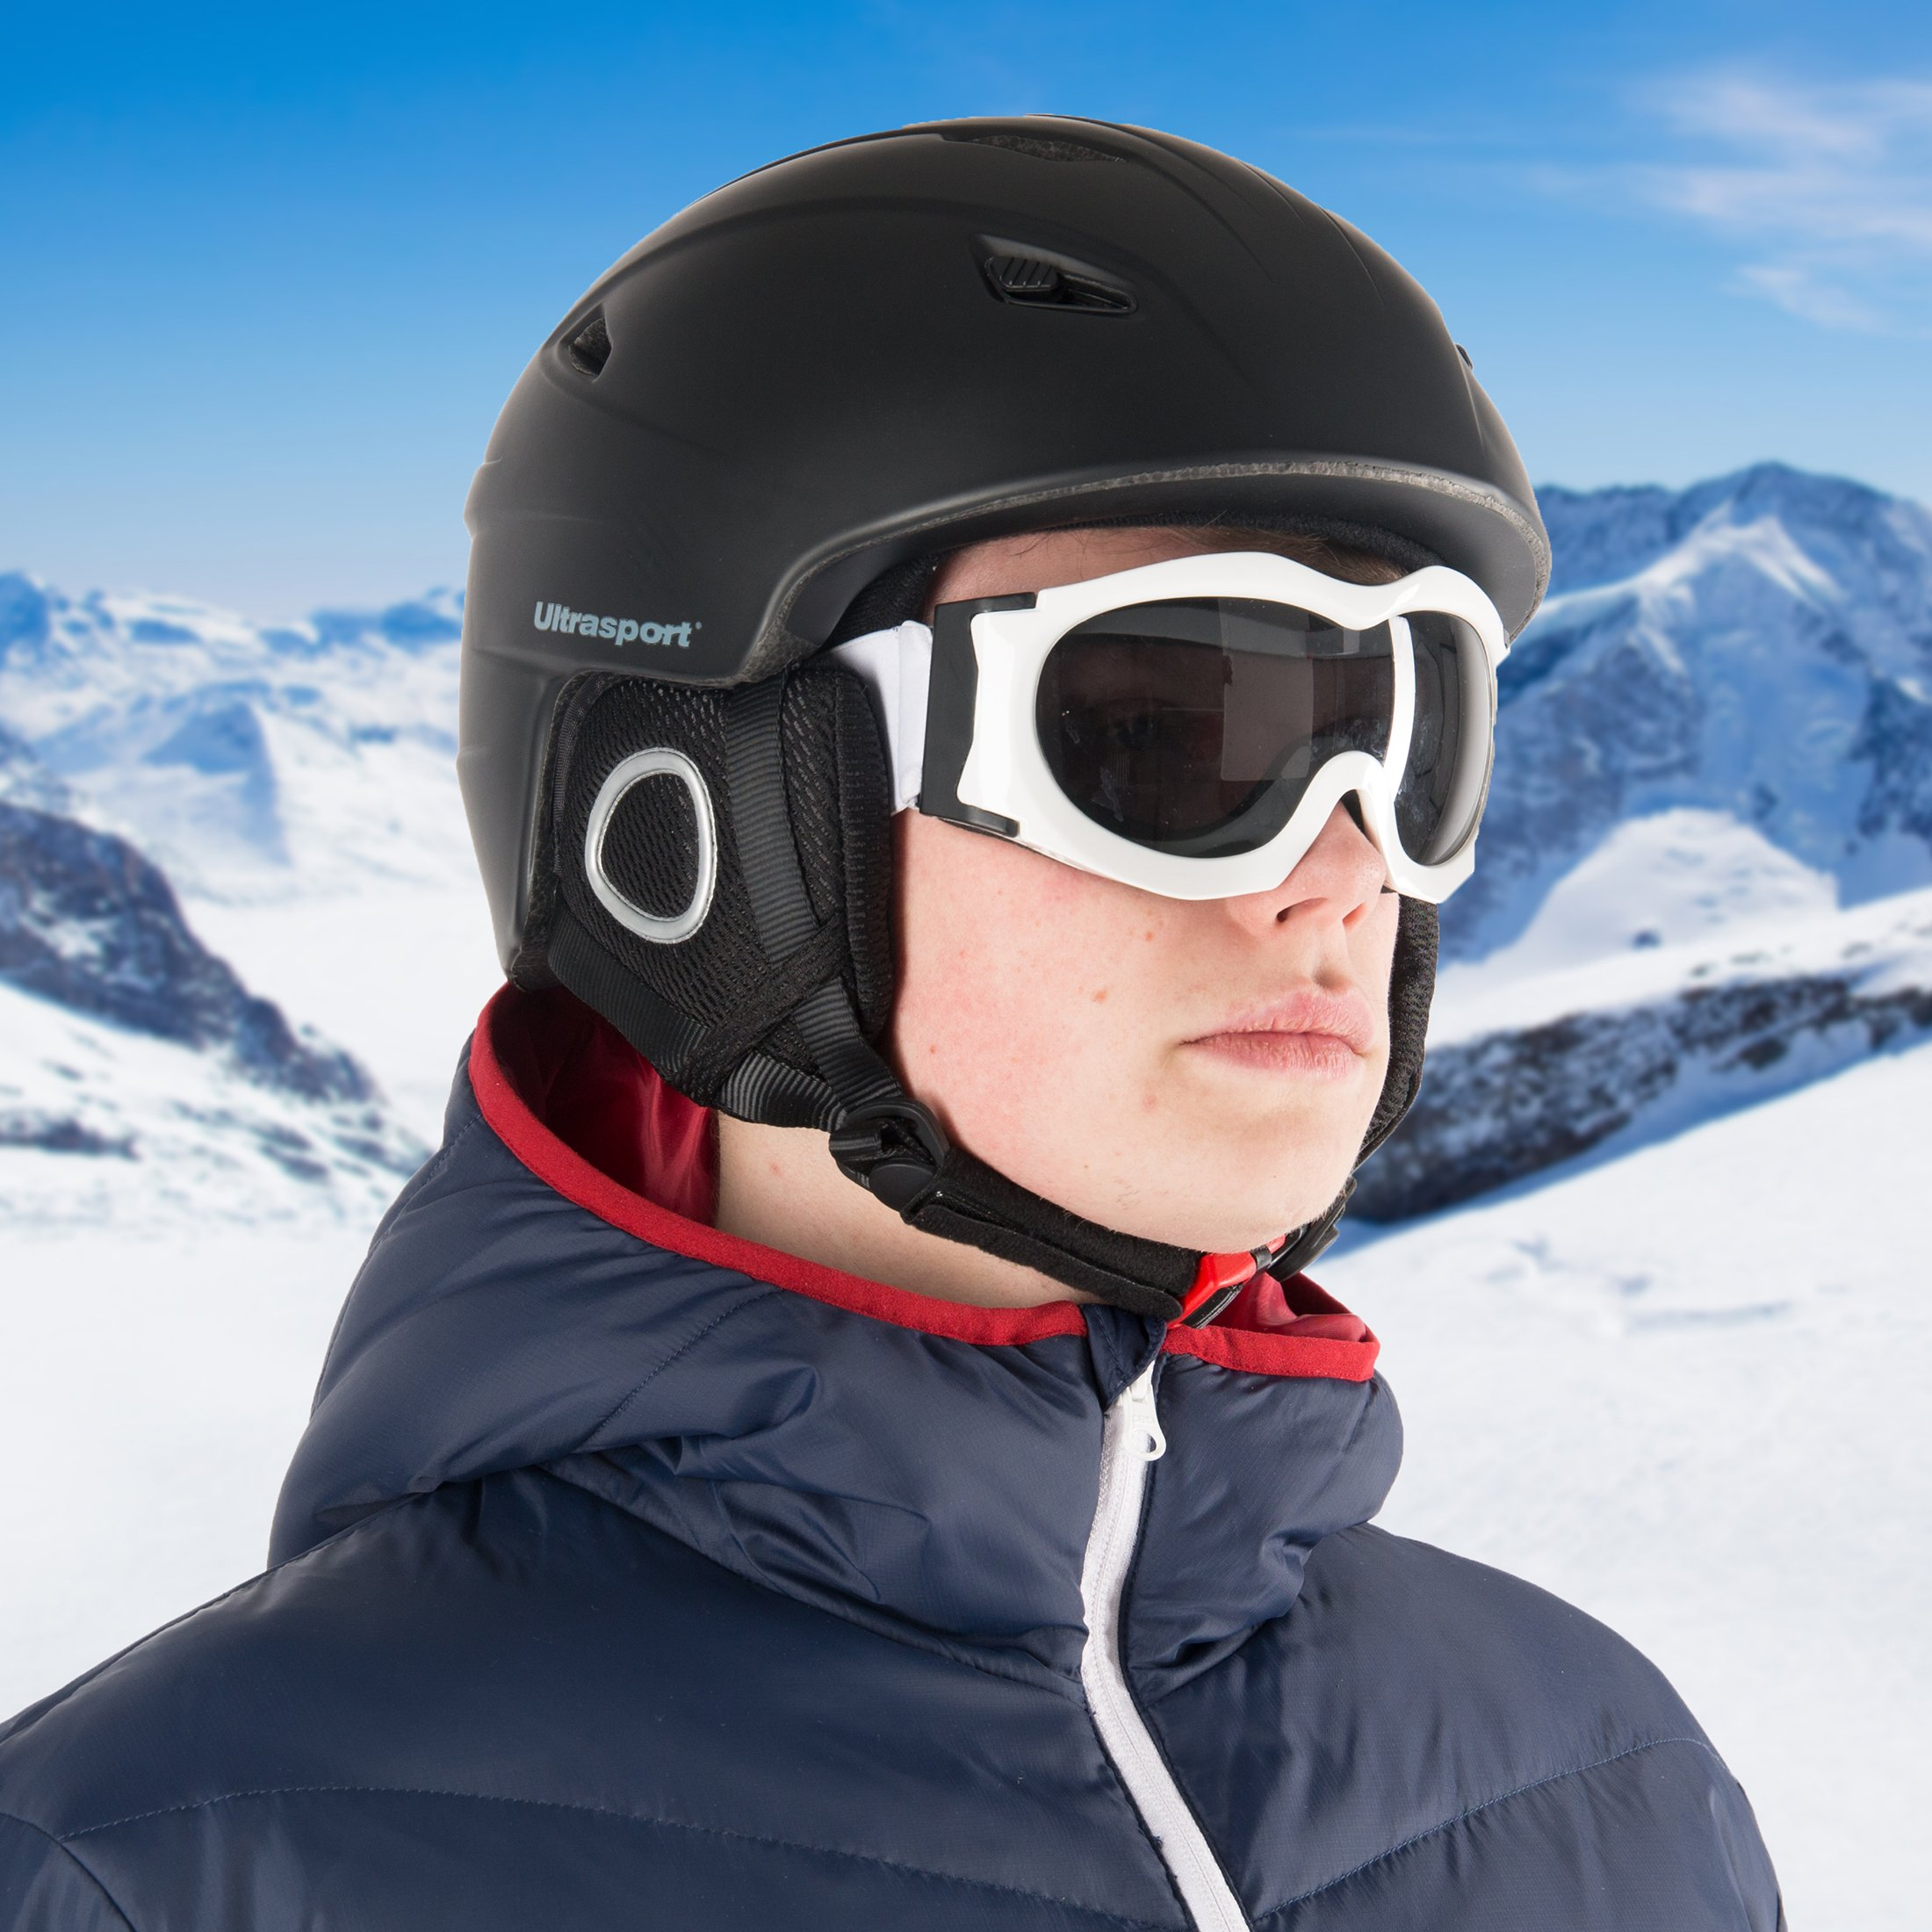 d1a1d86b5bf Ultrasport New Race Edition Casco per Snowboard